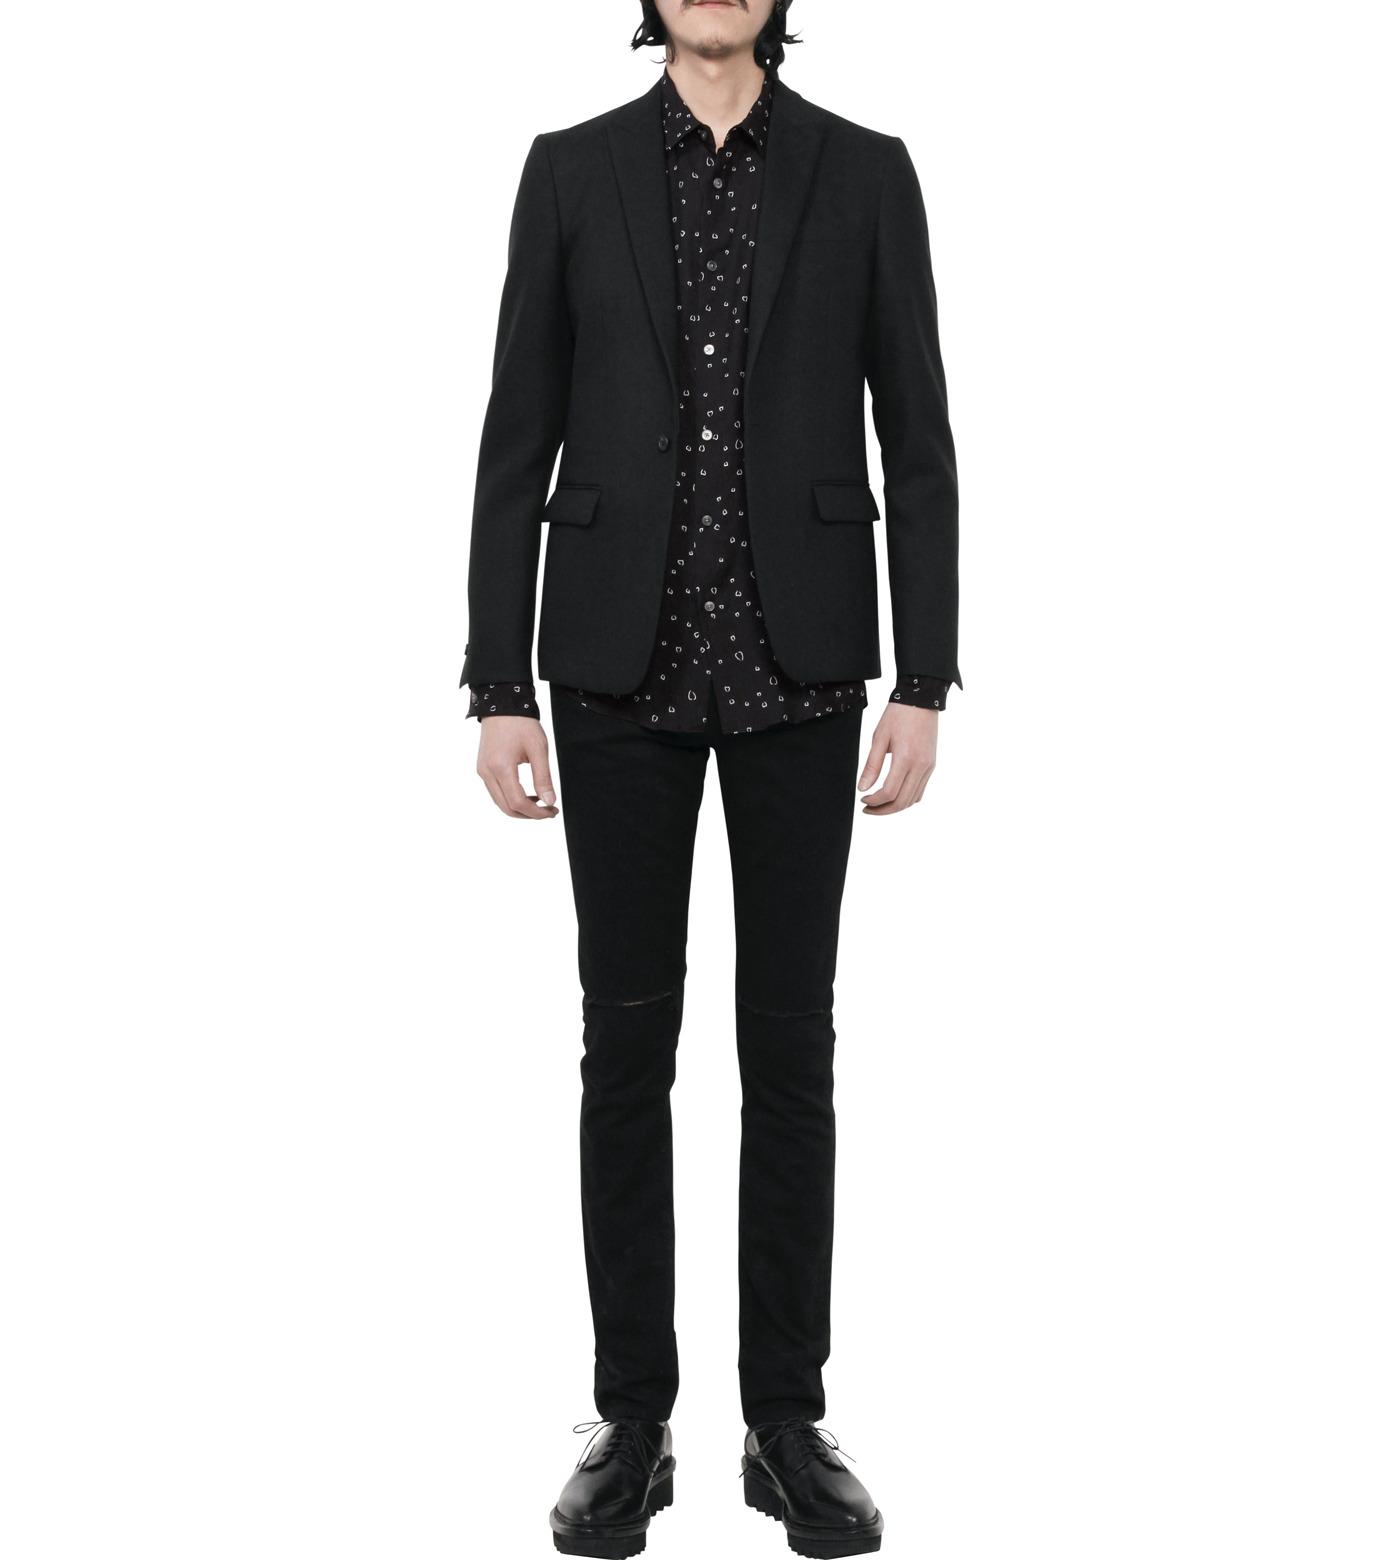 HL HEDDIE LOVU(エイチエル・エディールーヴ)のLINE HEART PATTERN SHIRT-BLACK(シャツ/shirt)-18S93002-13 拡大詳細画像5